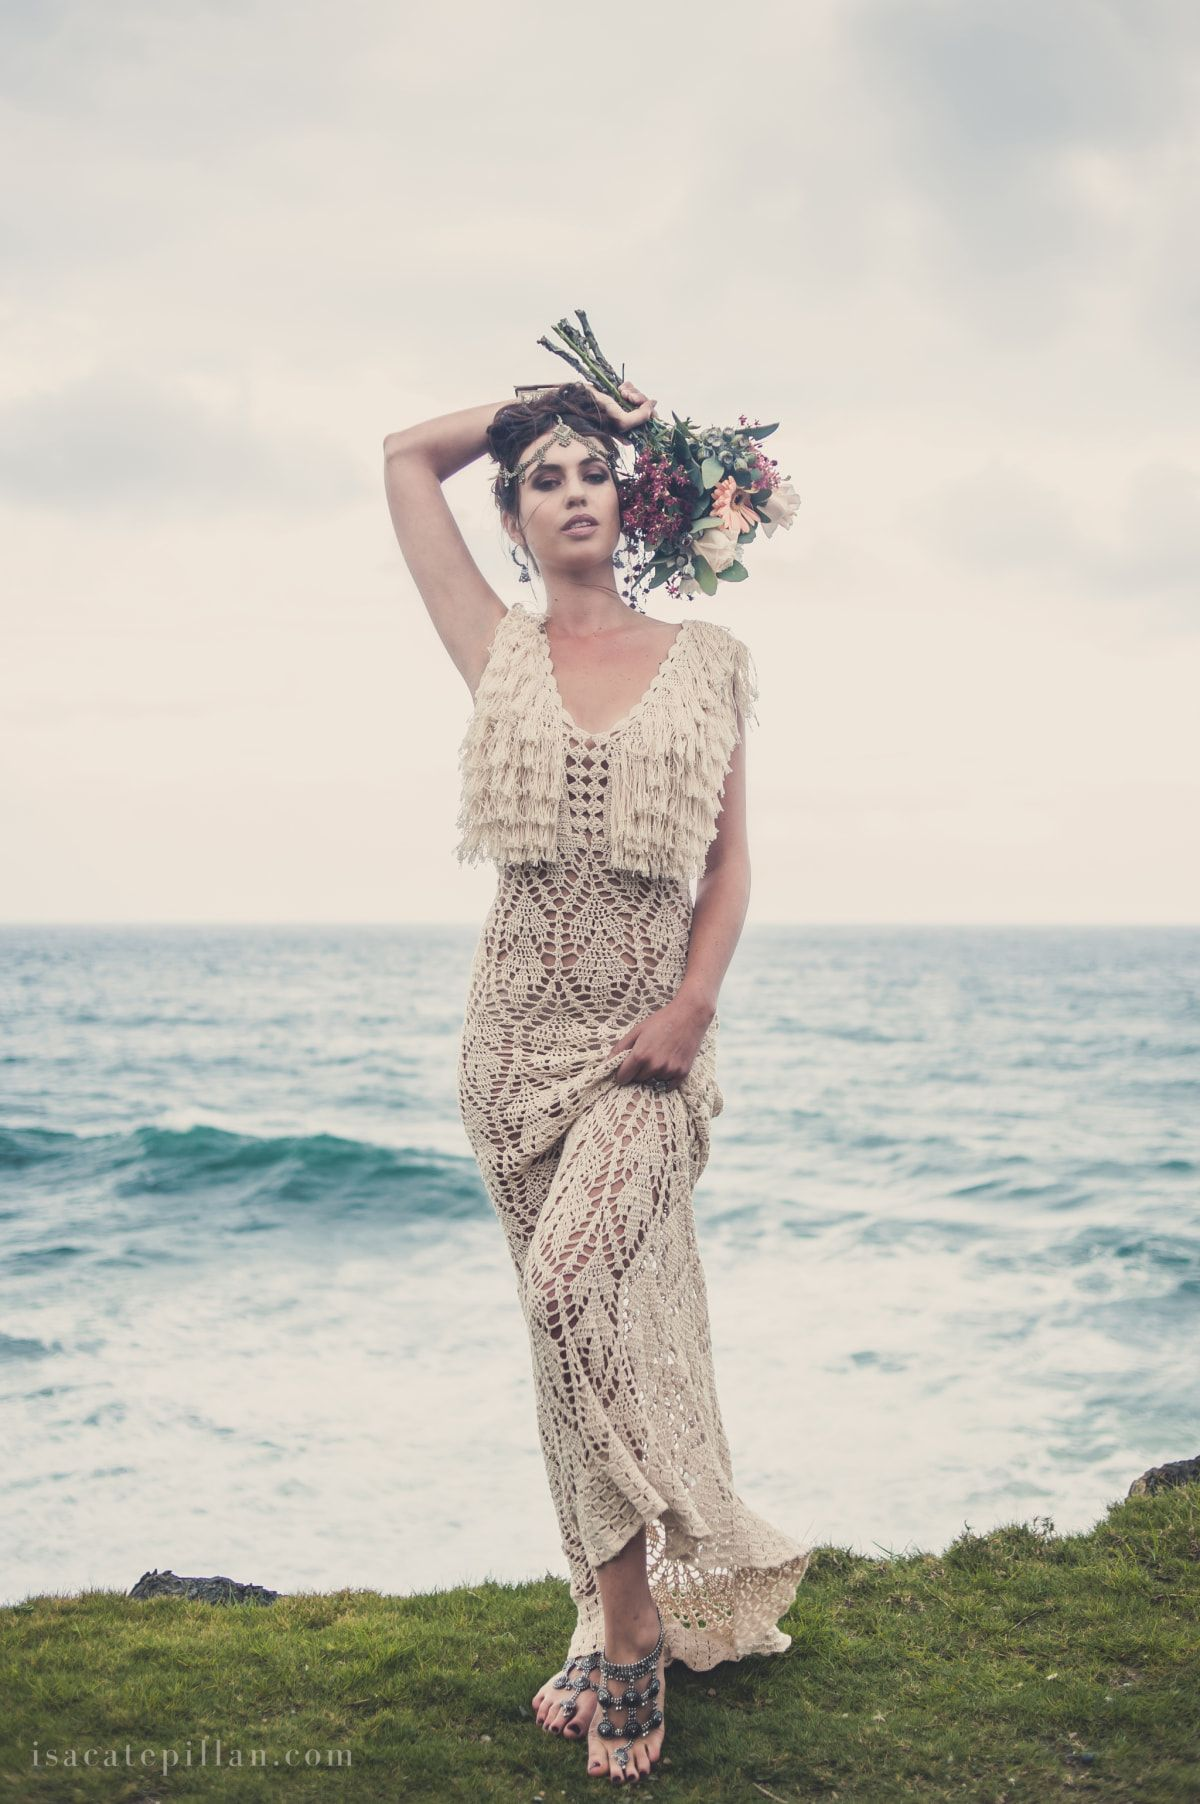 Crochet Wedding Dresses Crochet wedding dresses, Crochet